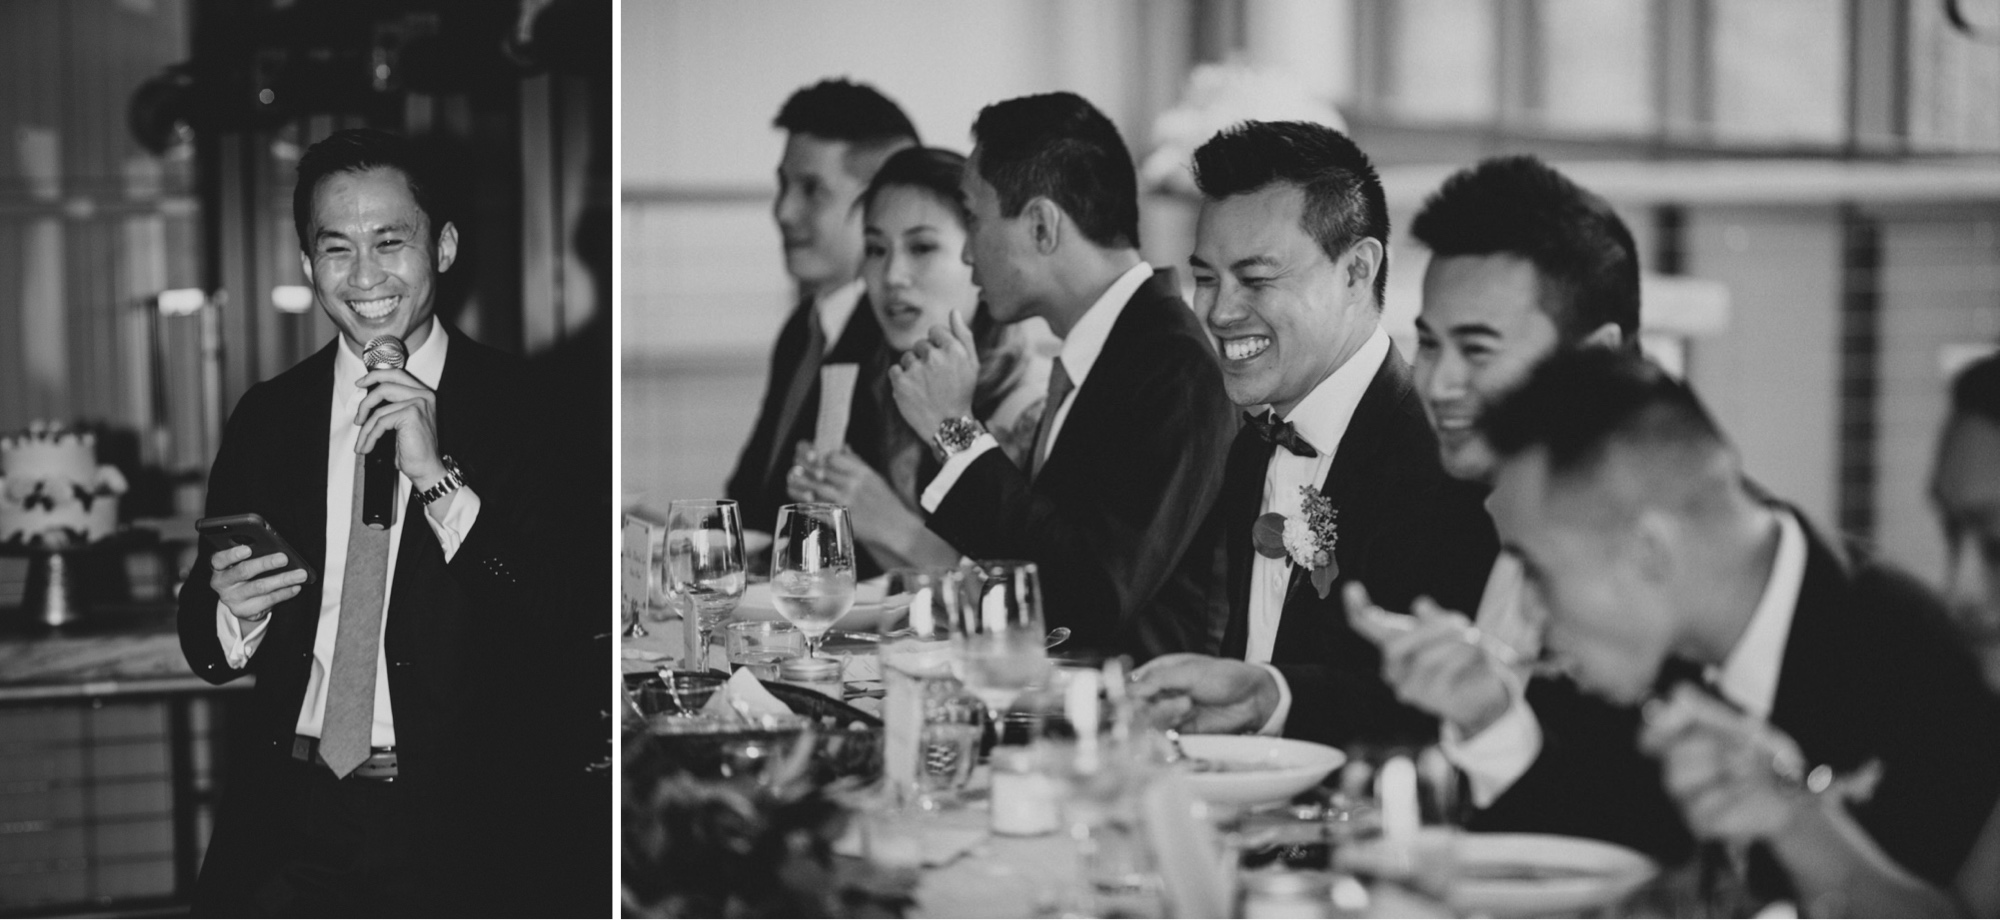 Reception Wedding black and white